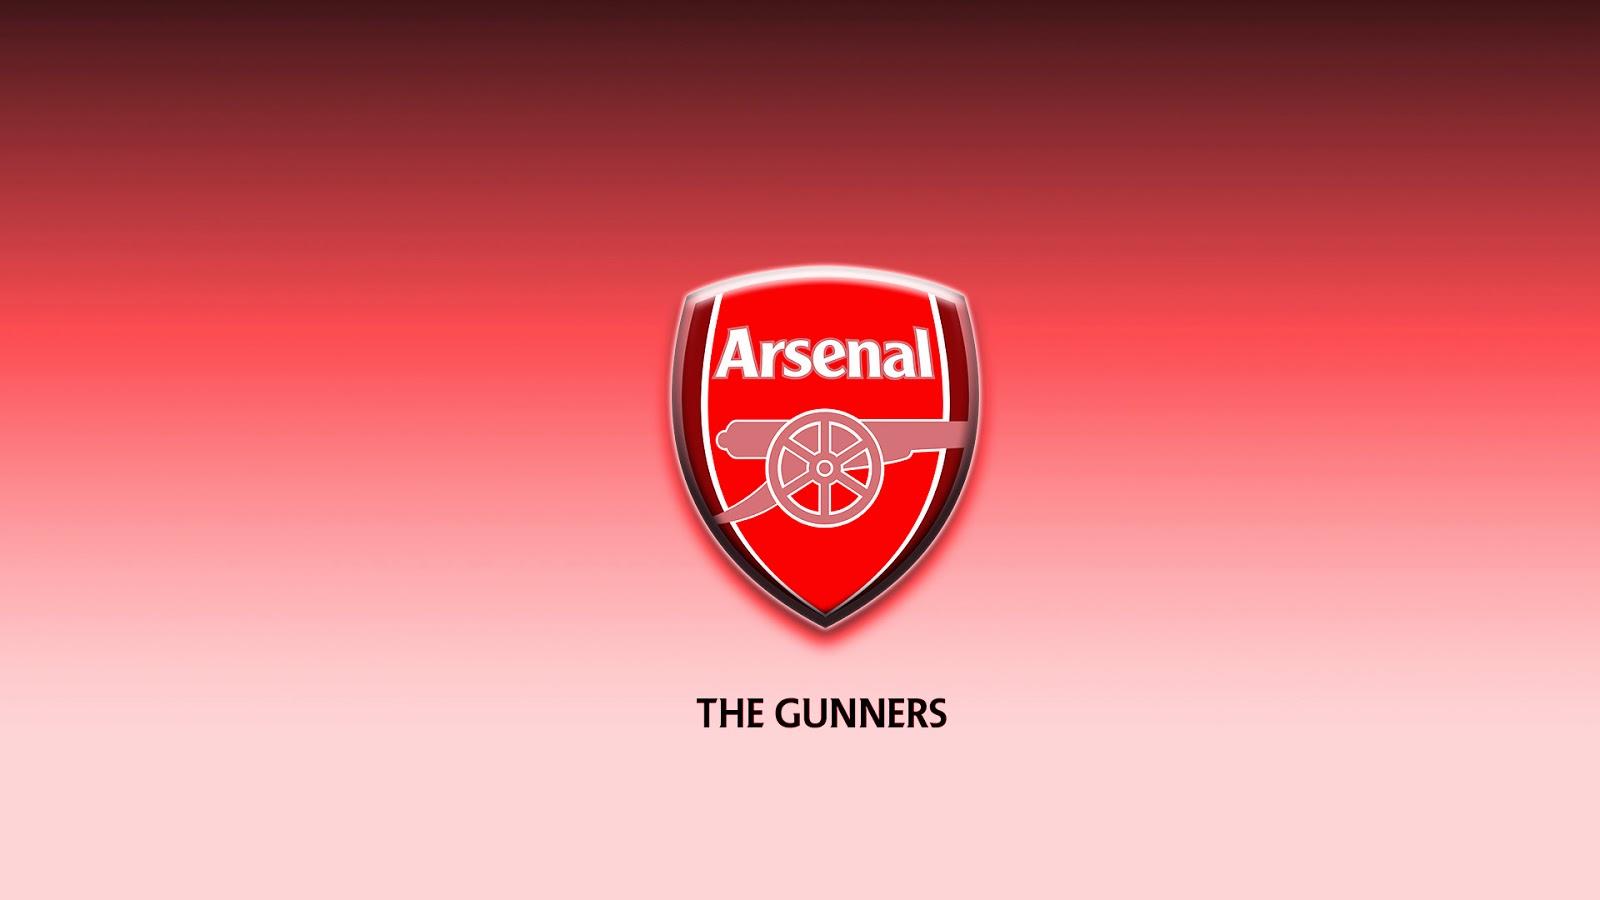 Iphone X Live Wallpaper App Arsenal Football Club Wallpaper Football Wallpaper Hd